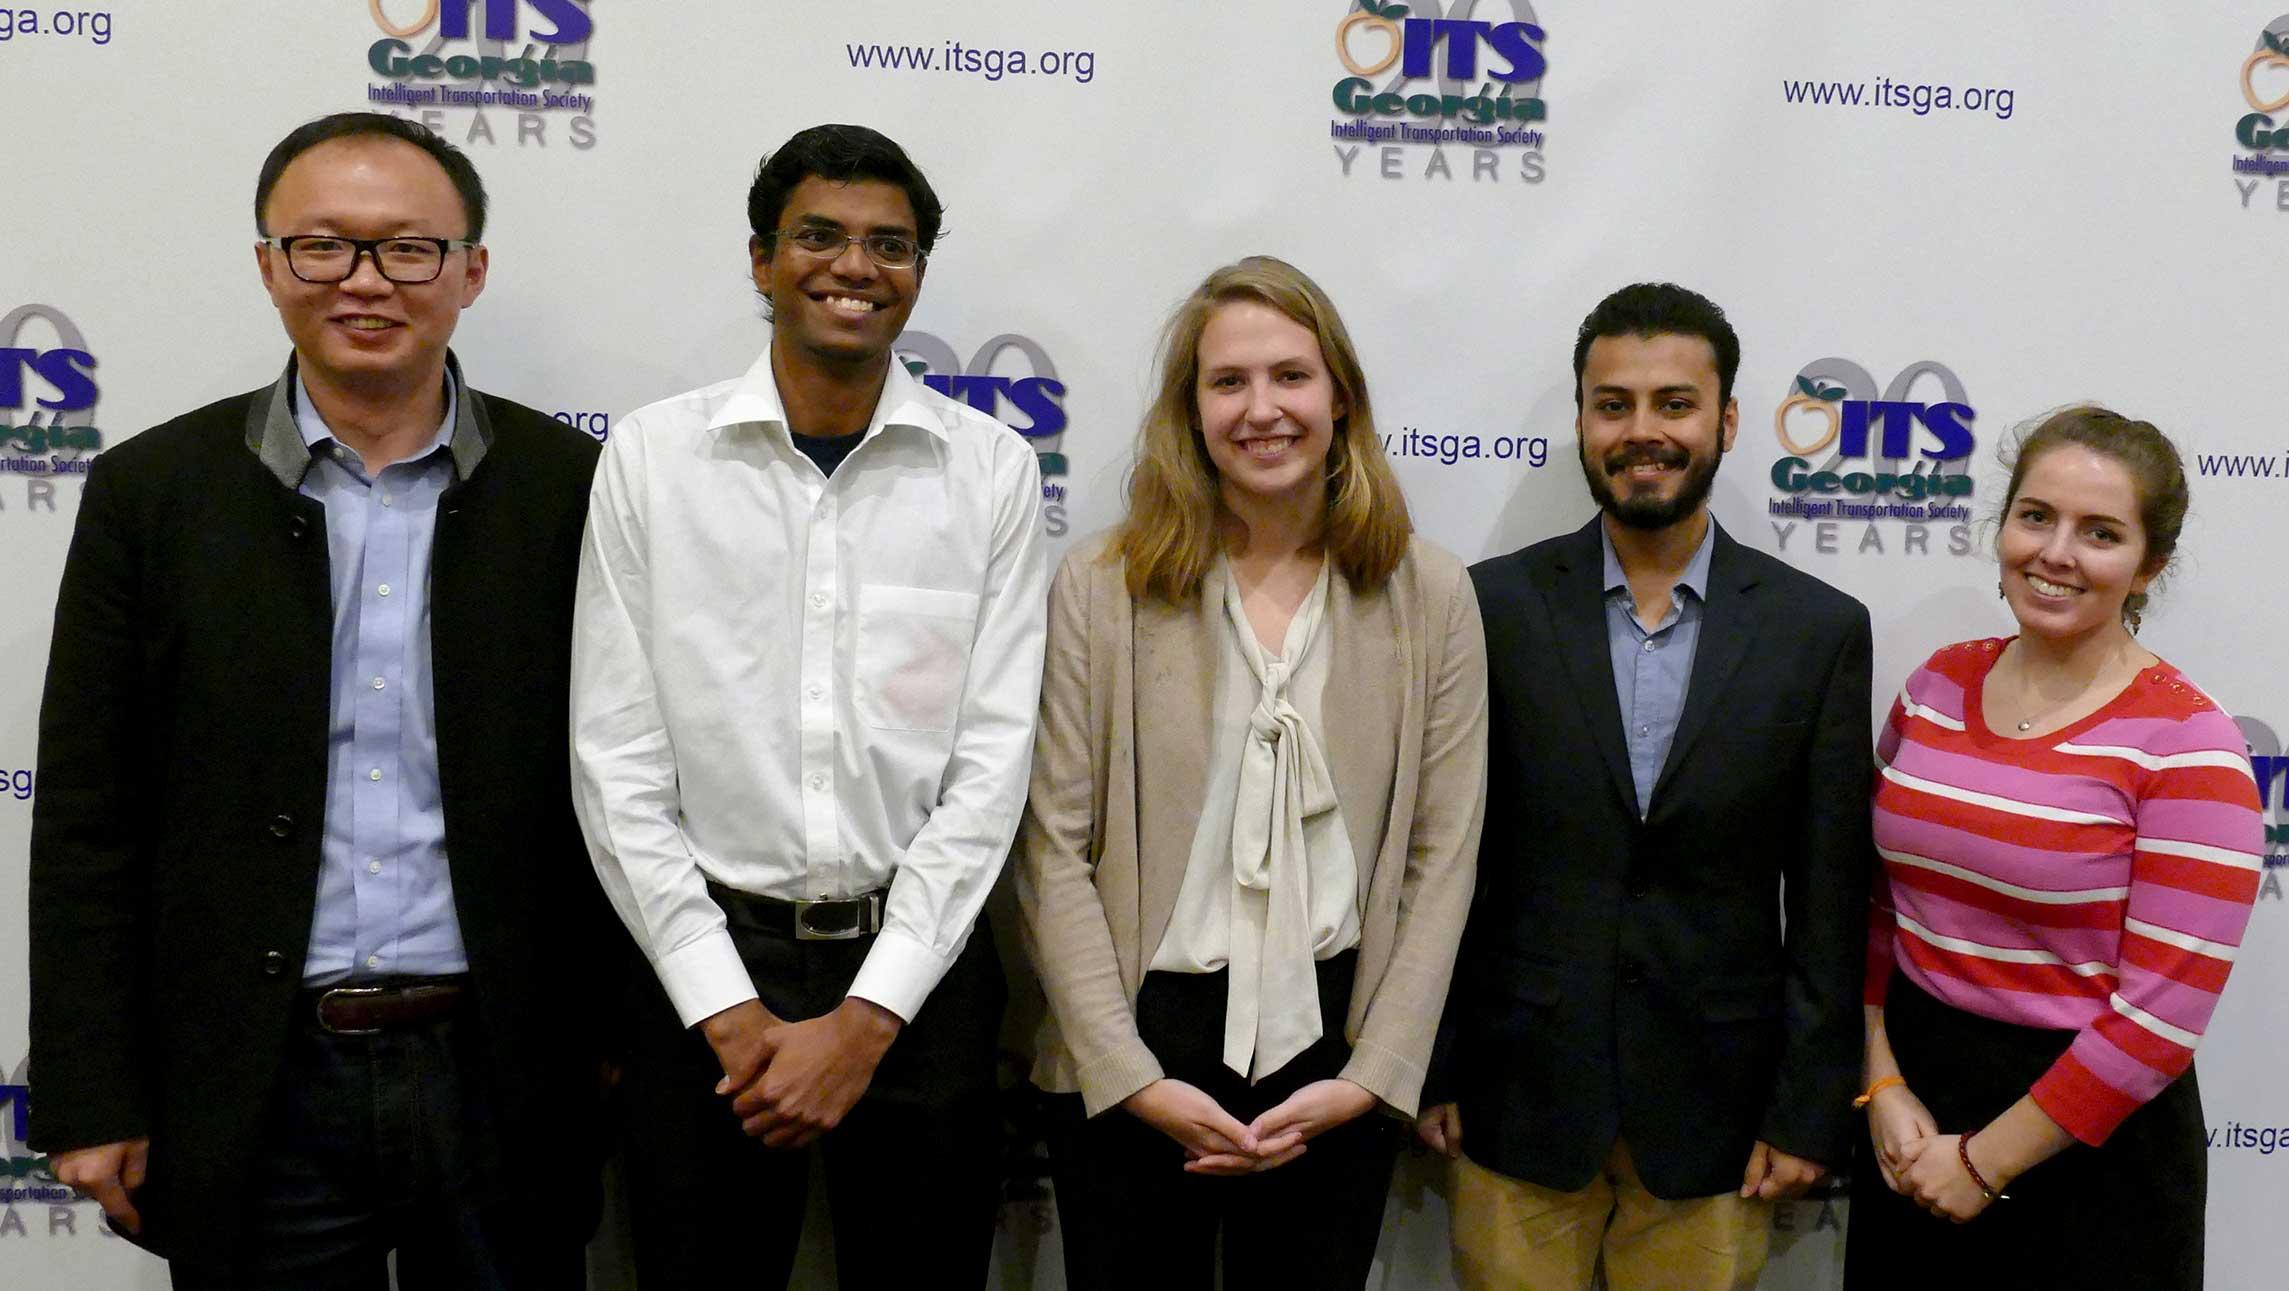 2017 Wayne Shackelford Scholarship Winners